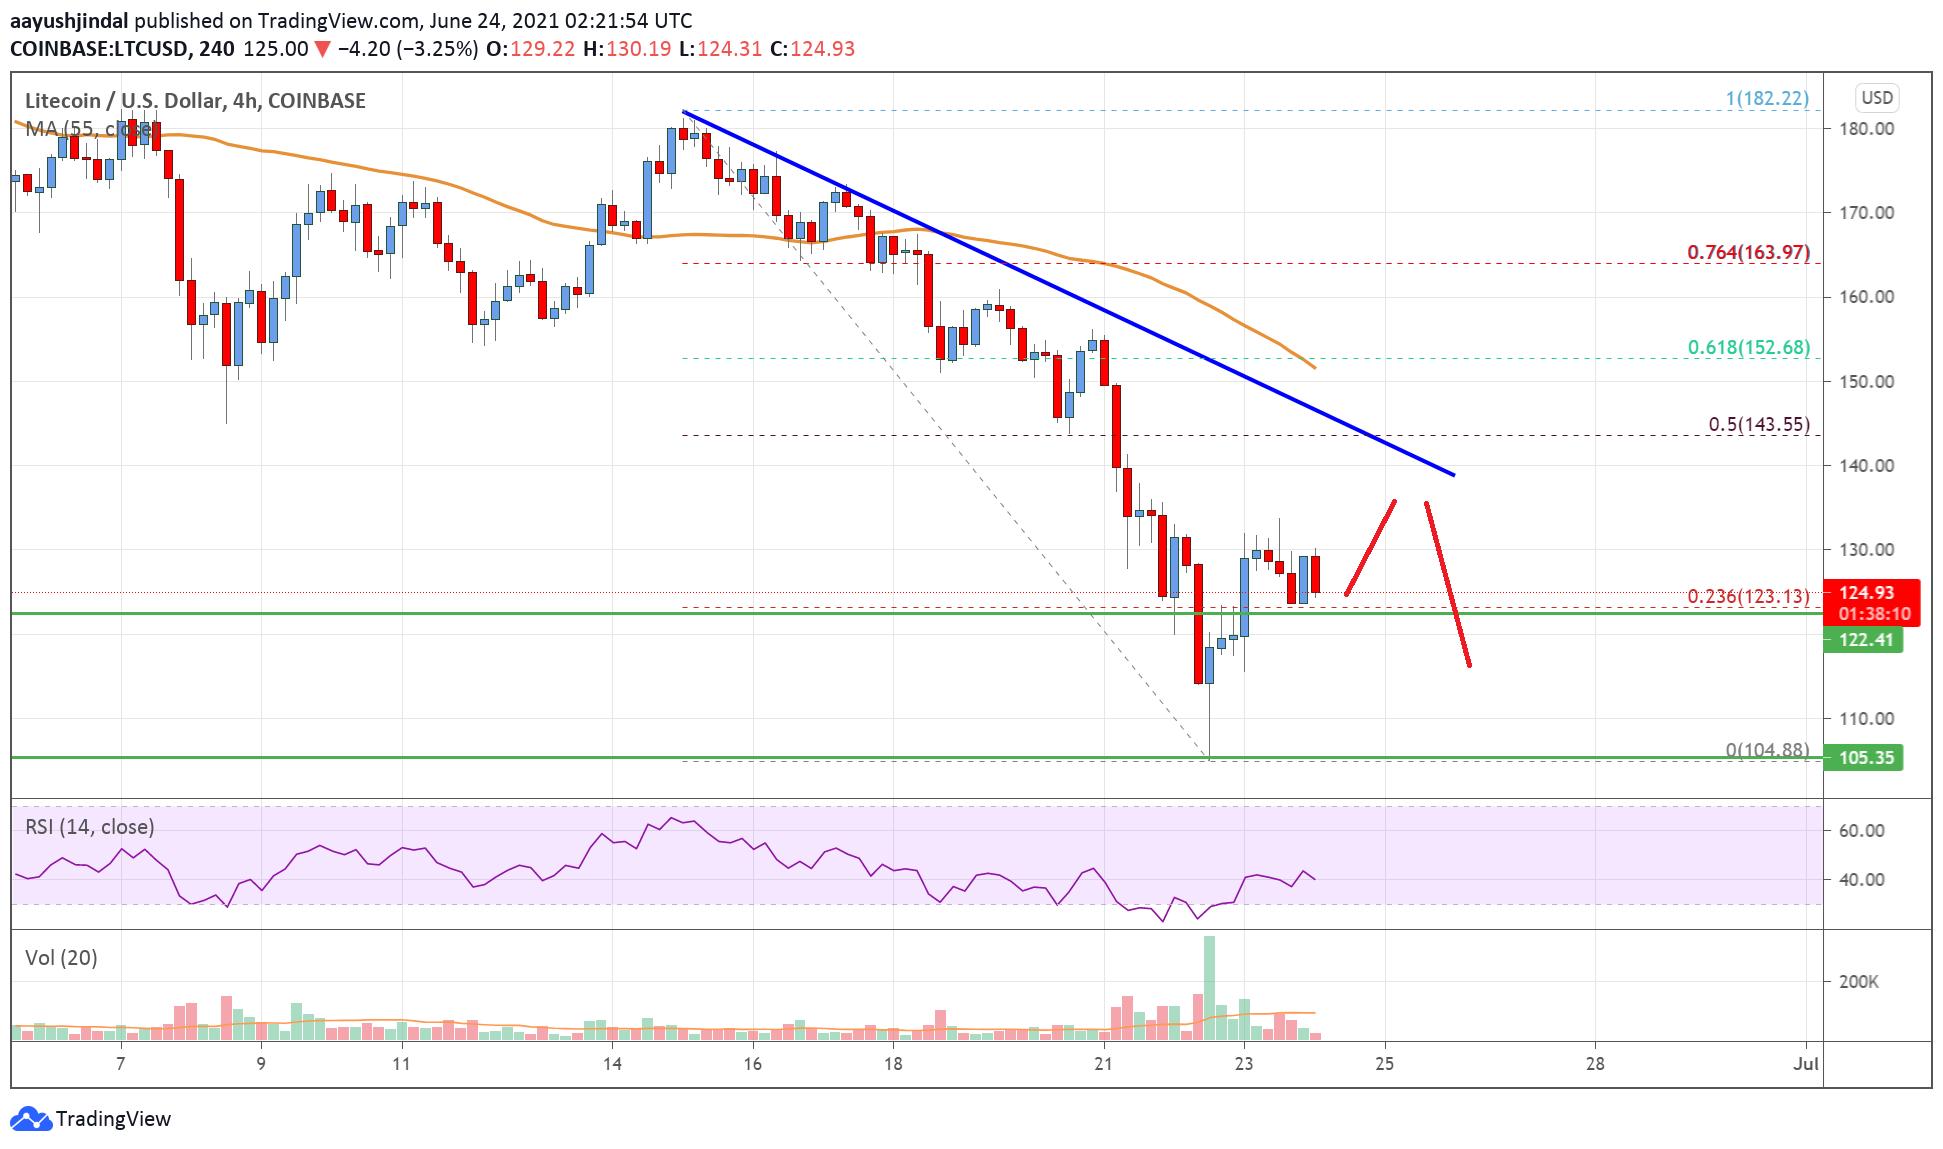 Litecoin (LTC) Price Analysis: Bulls Facing Uphill Task Near $140 | Live Bitcoin News